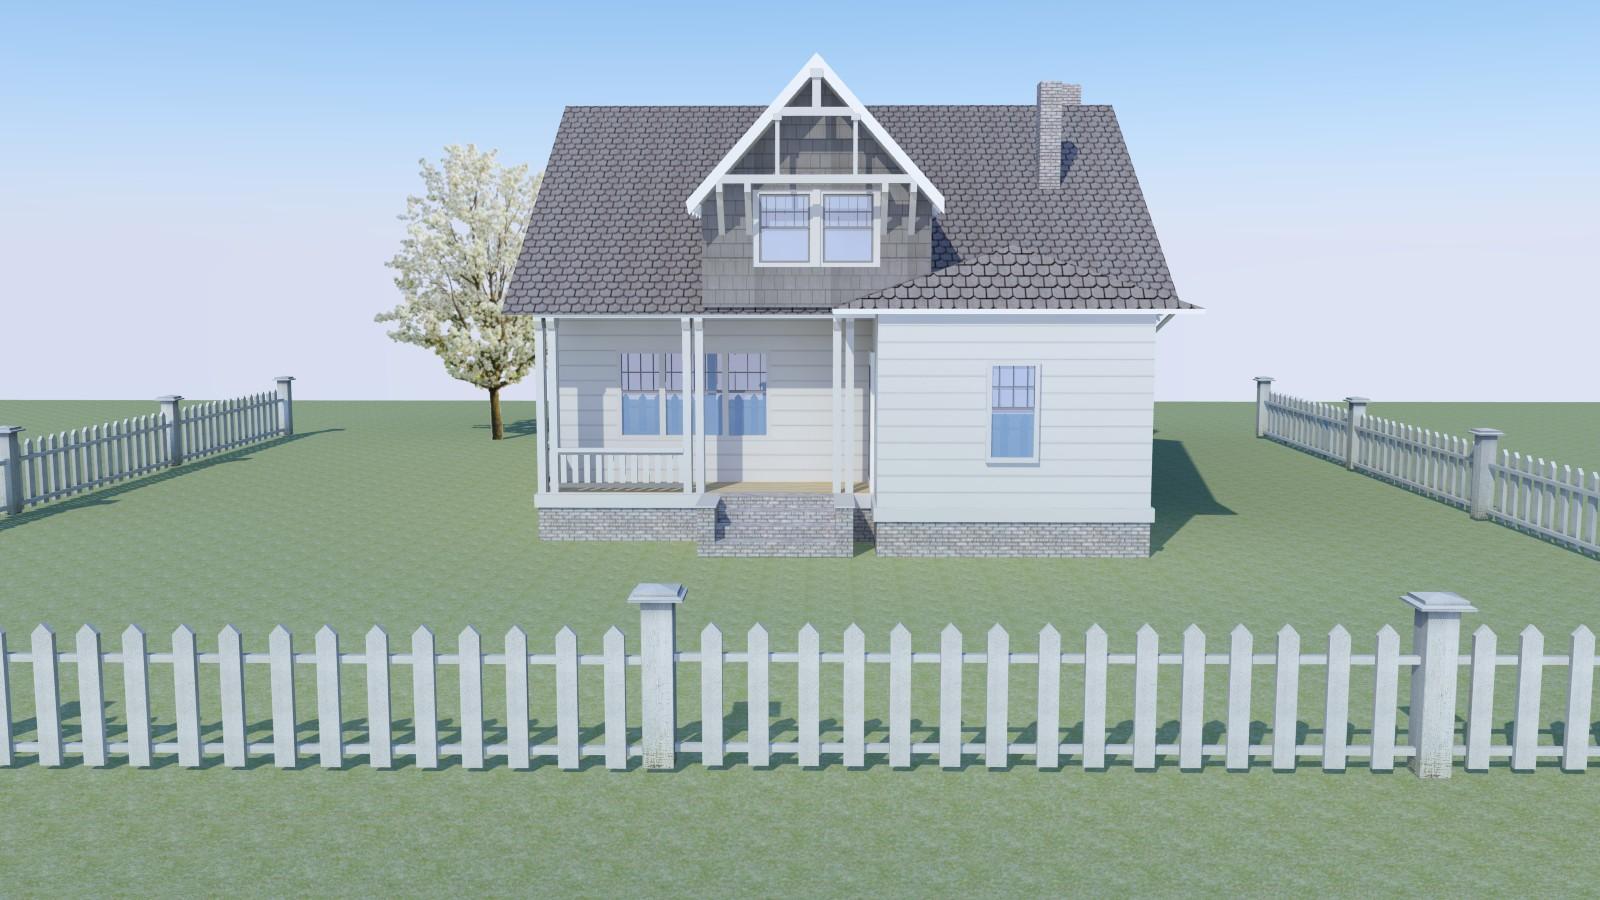 Historical concepts house plans house plans home designs for Historical concepts house plans